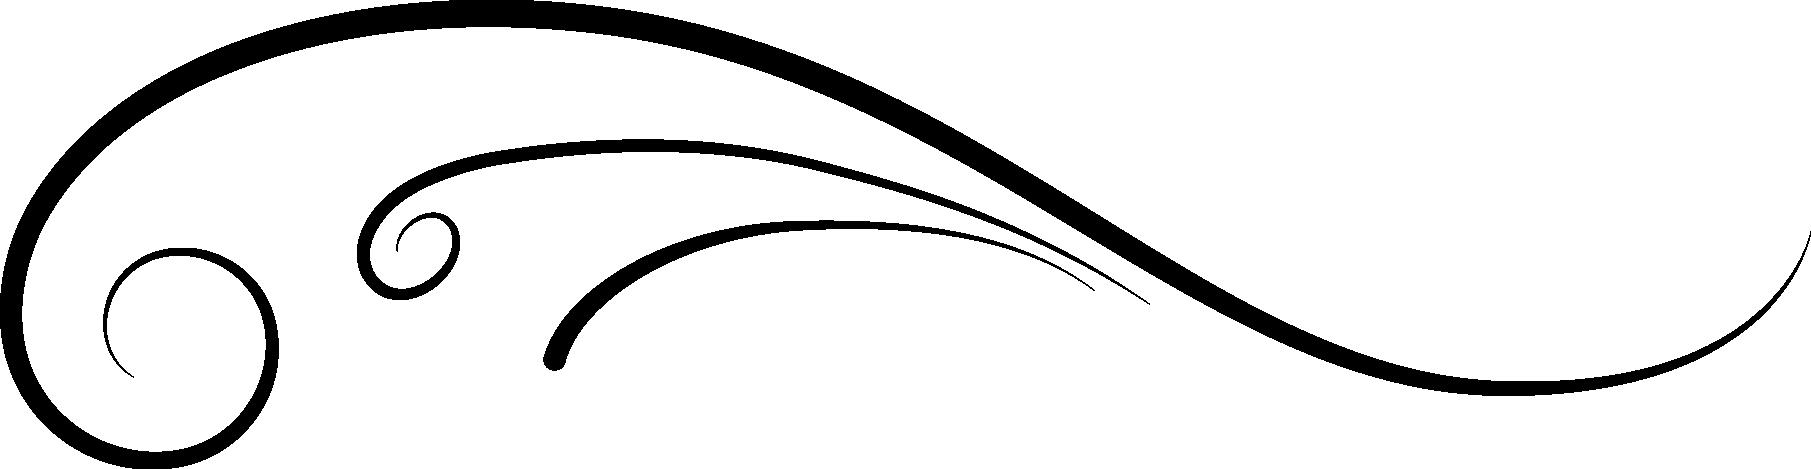 clipart-design-swirl-11-transparent_rt